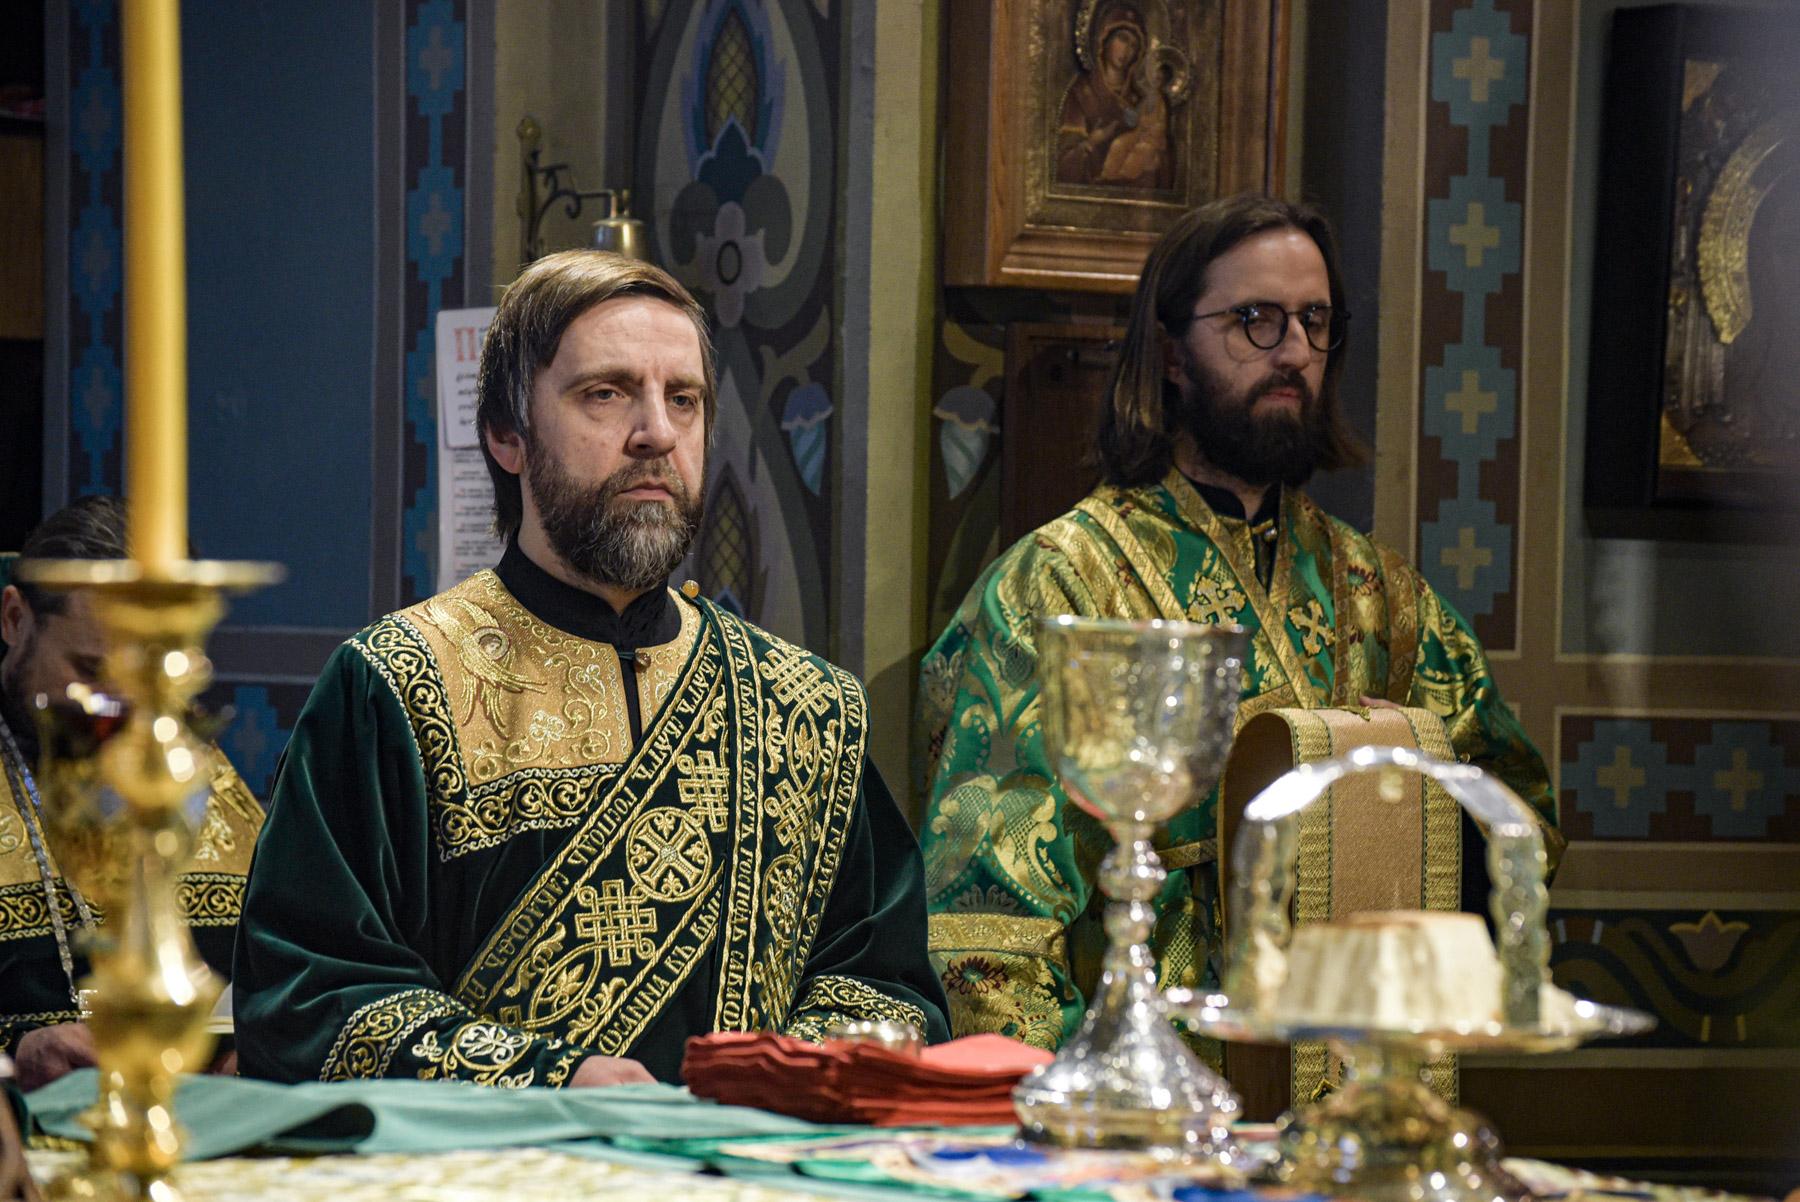 photos of orthodox christmas 0192 2